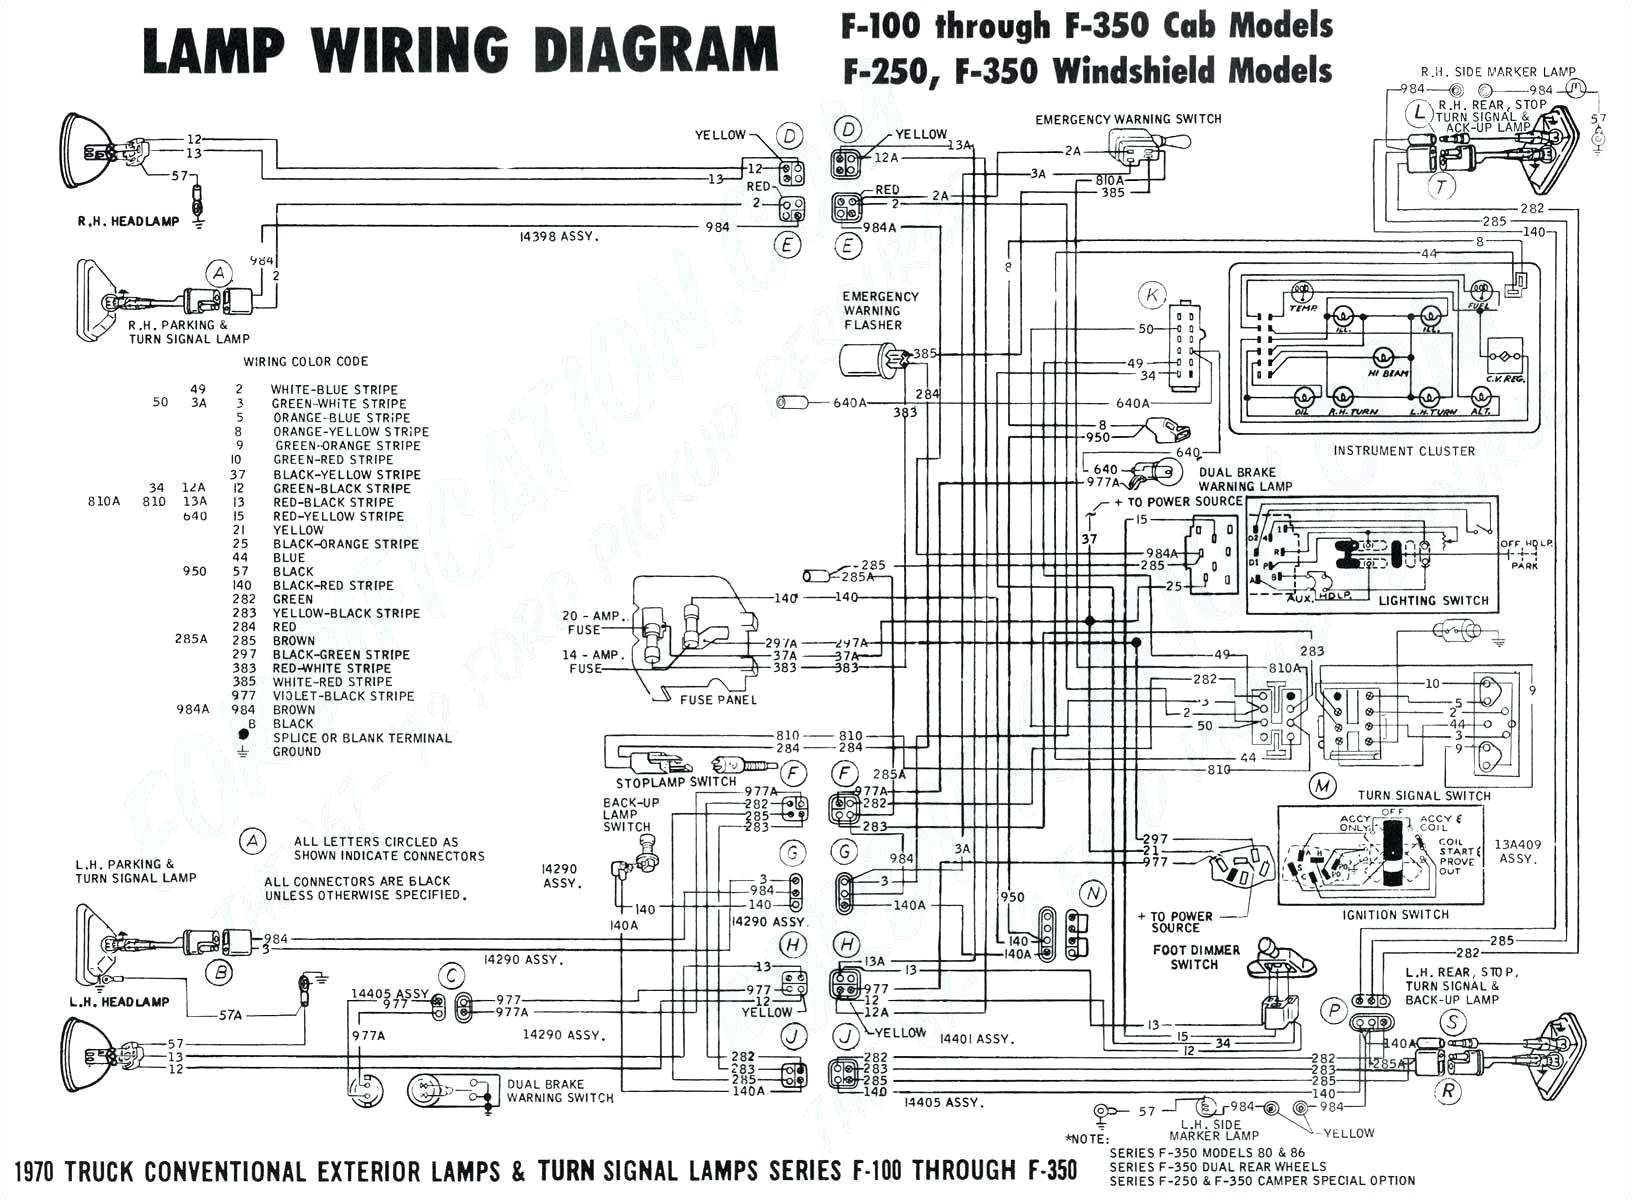 caravan fuse box 87 blog wiring diagram caravan fuse box 87